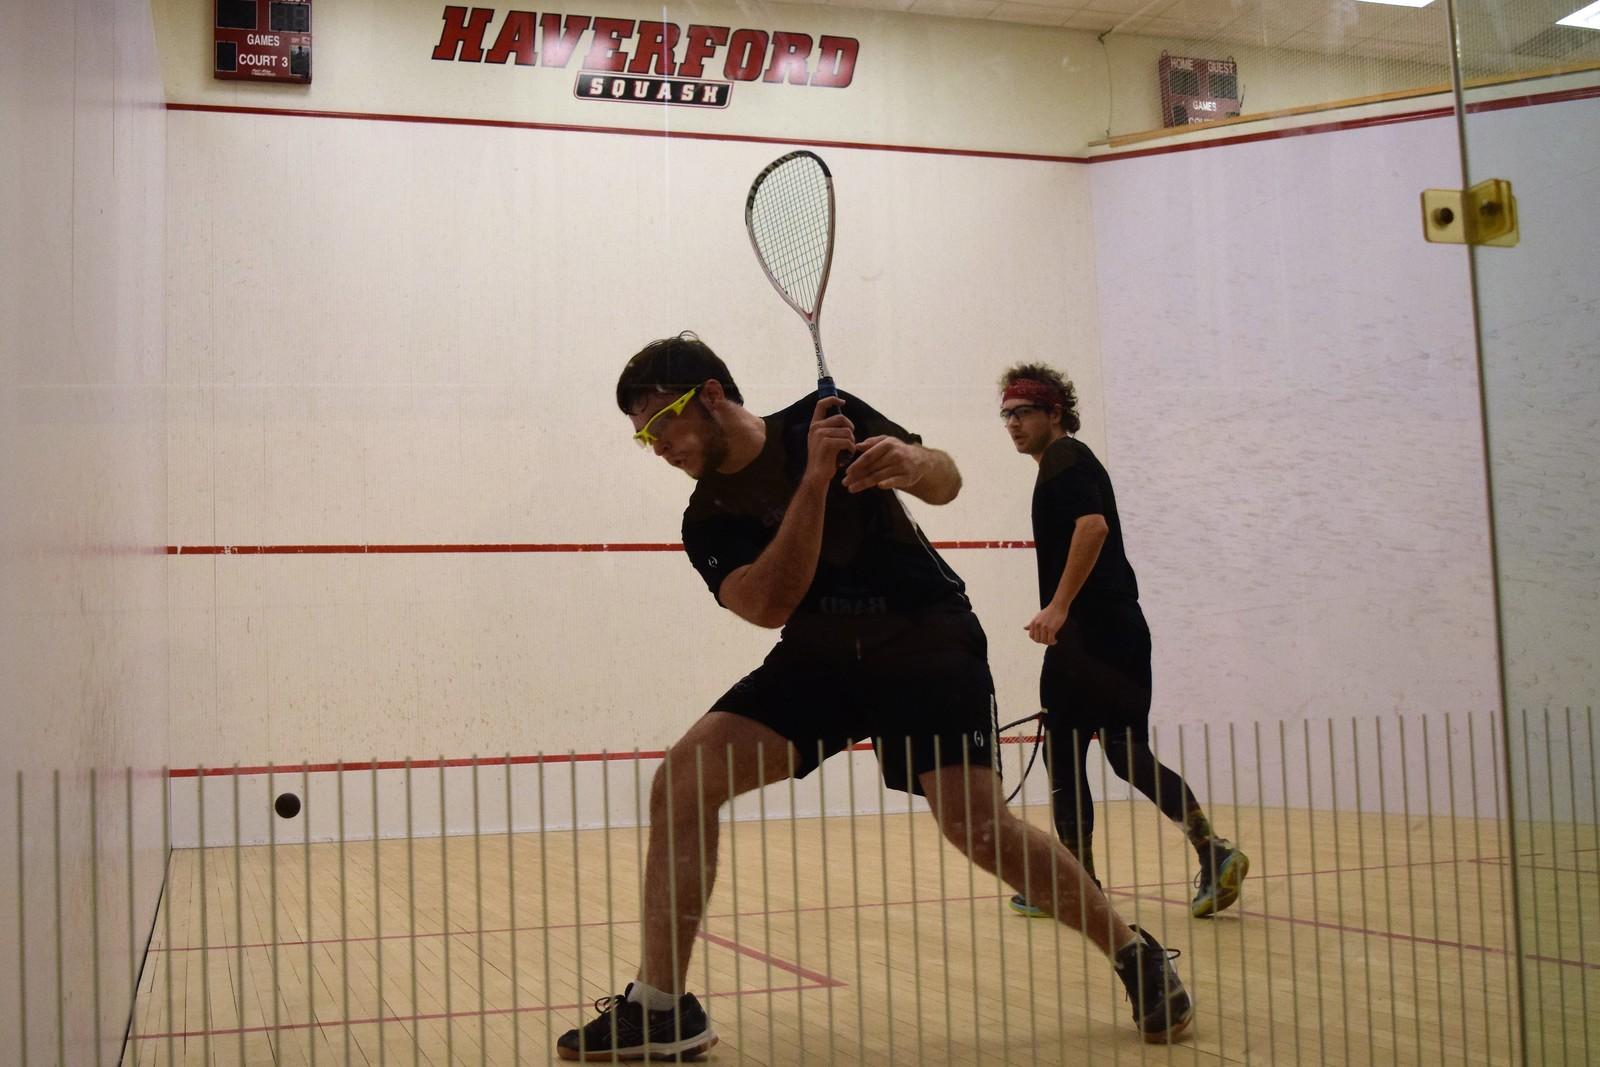 Vinicius Muniz '22 at a squash match